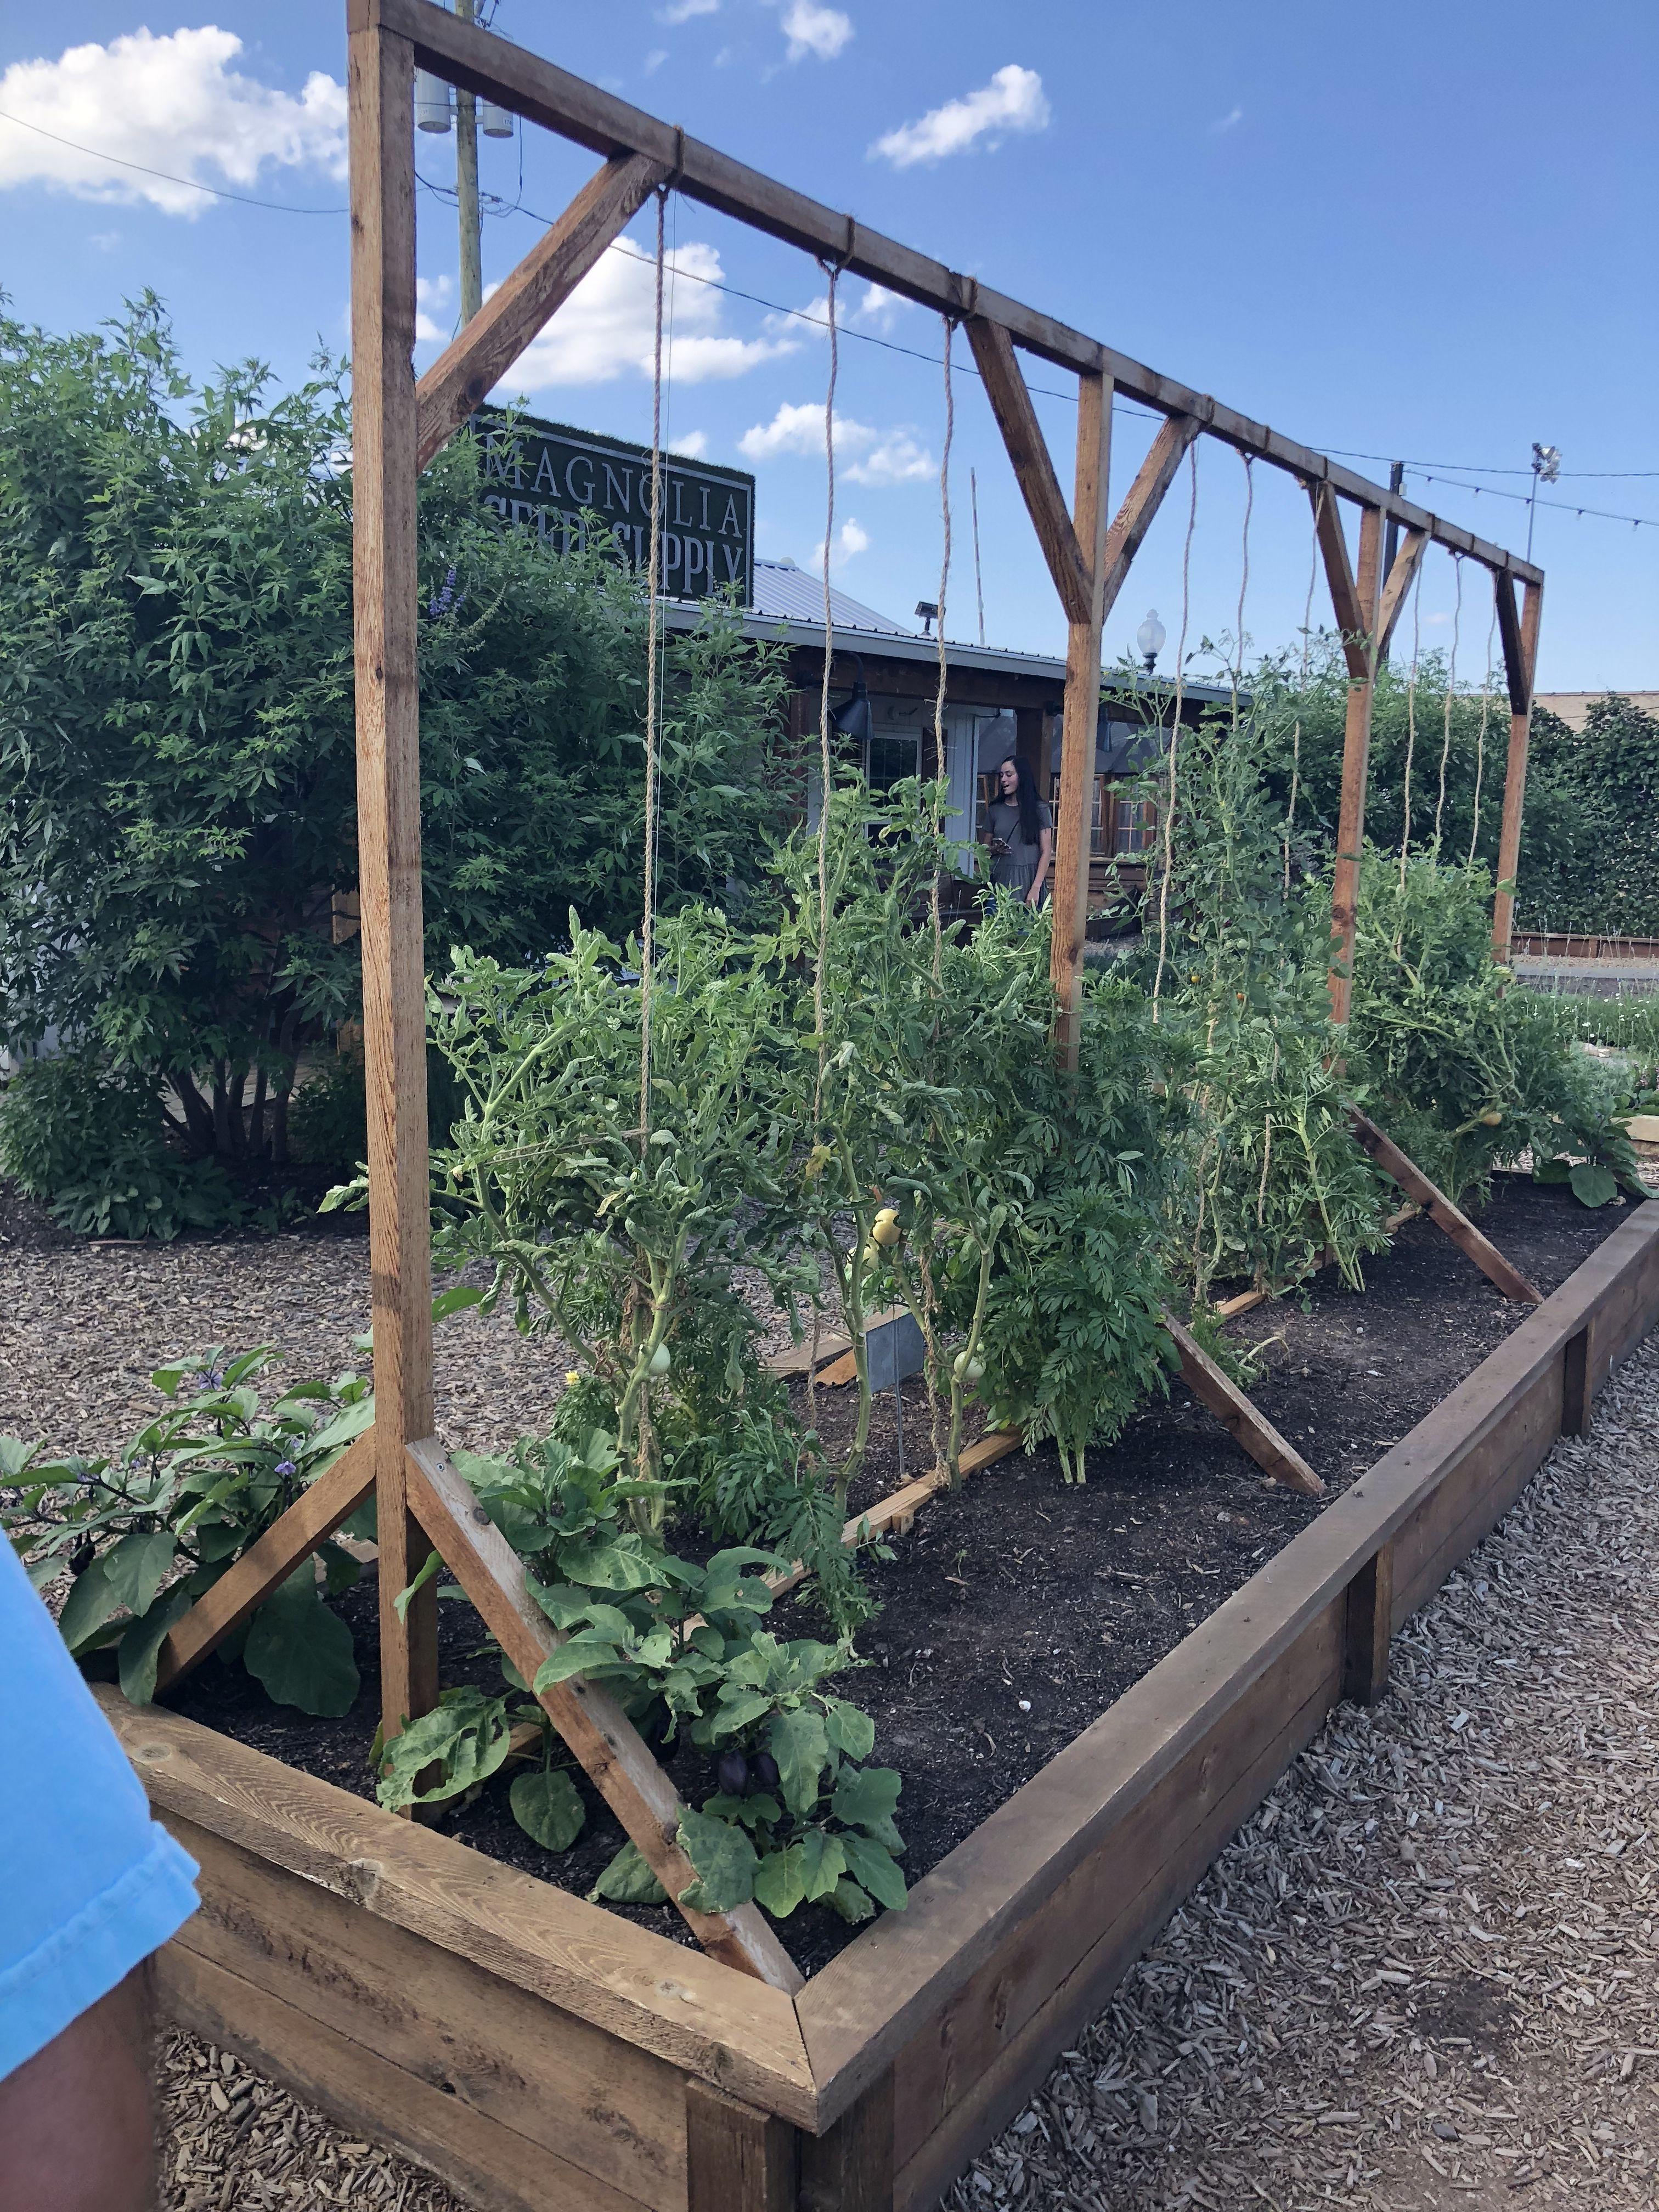 Tomato Trellises At Magnolia Silos In Waco Texas With Images